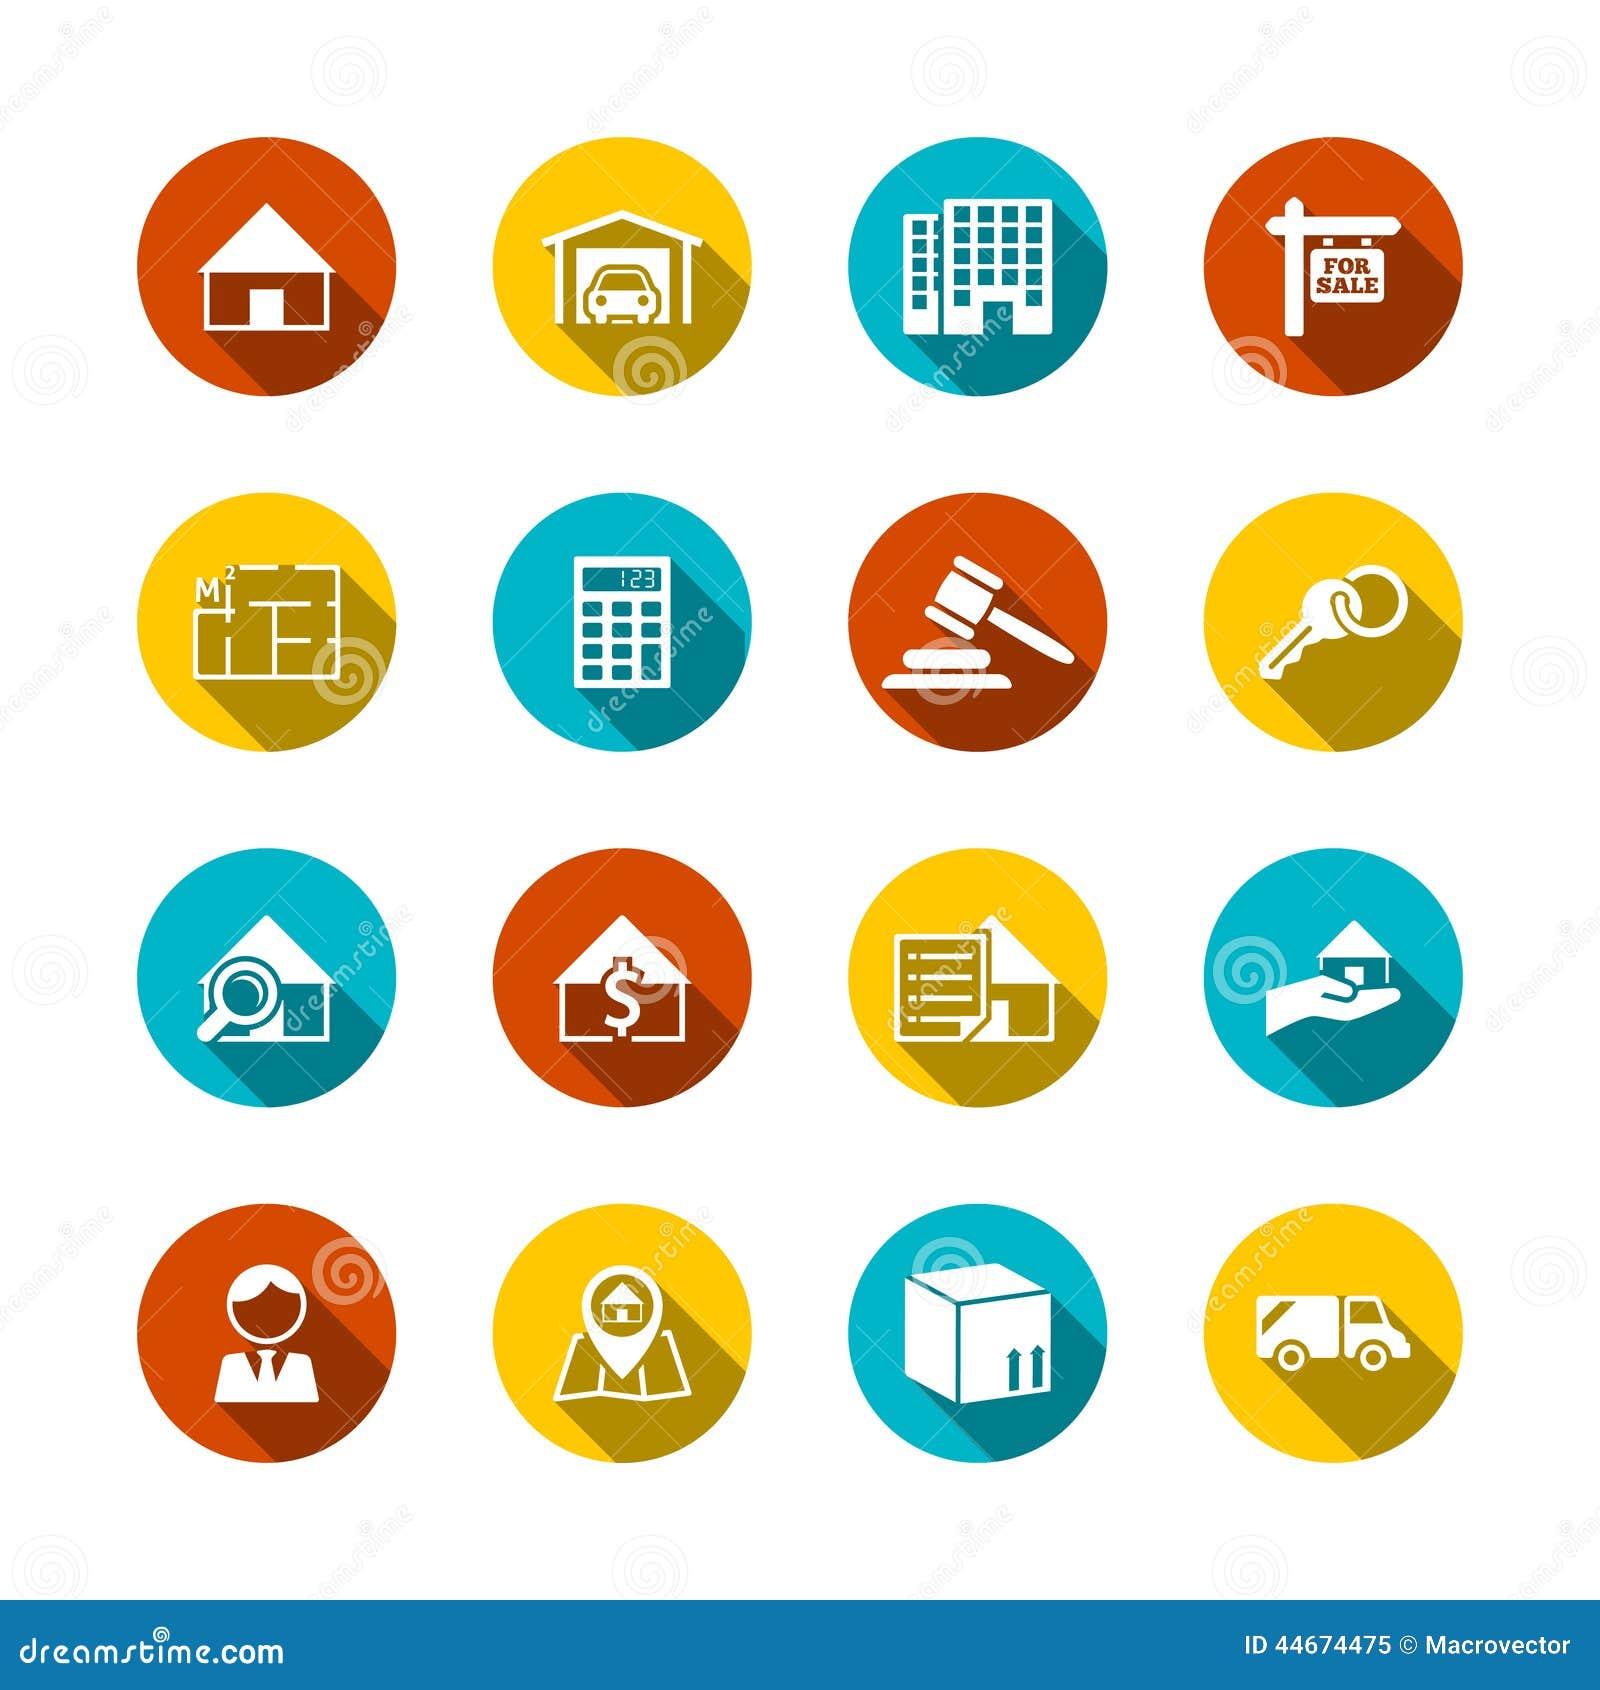 how to set up an estate plan